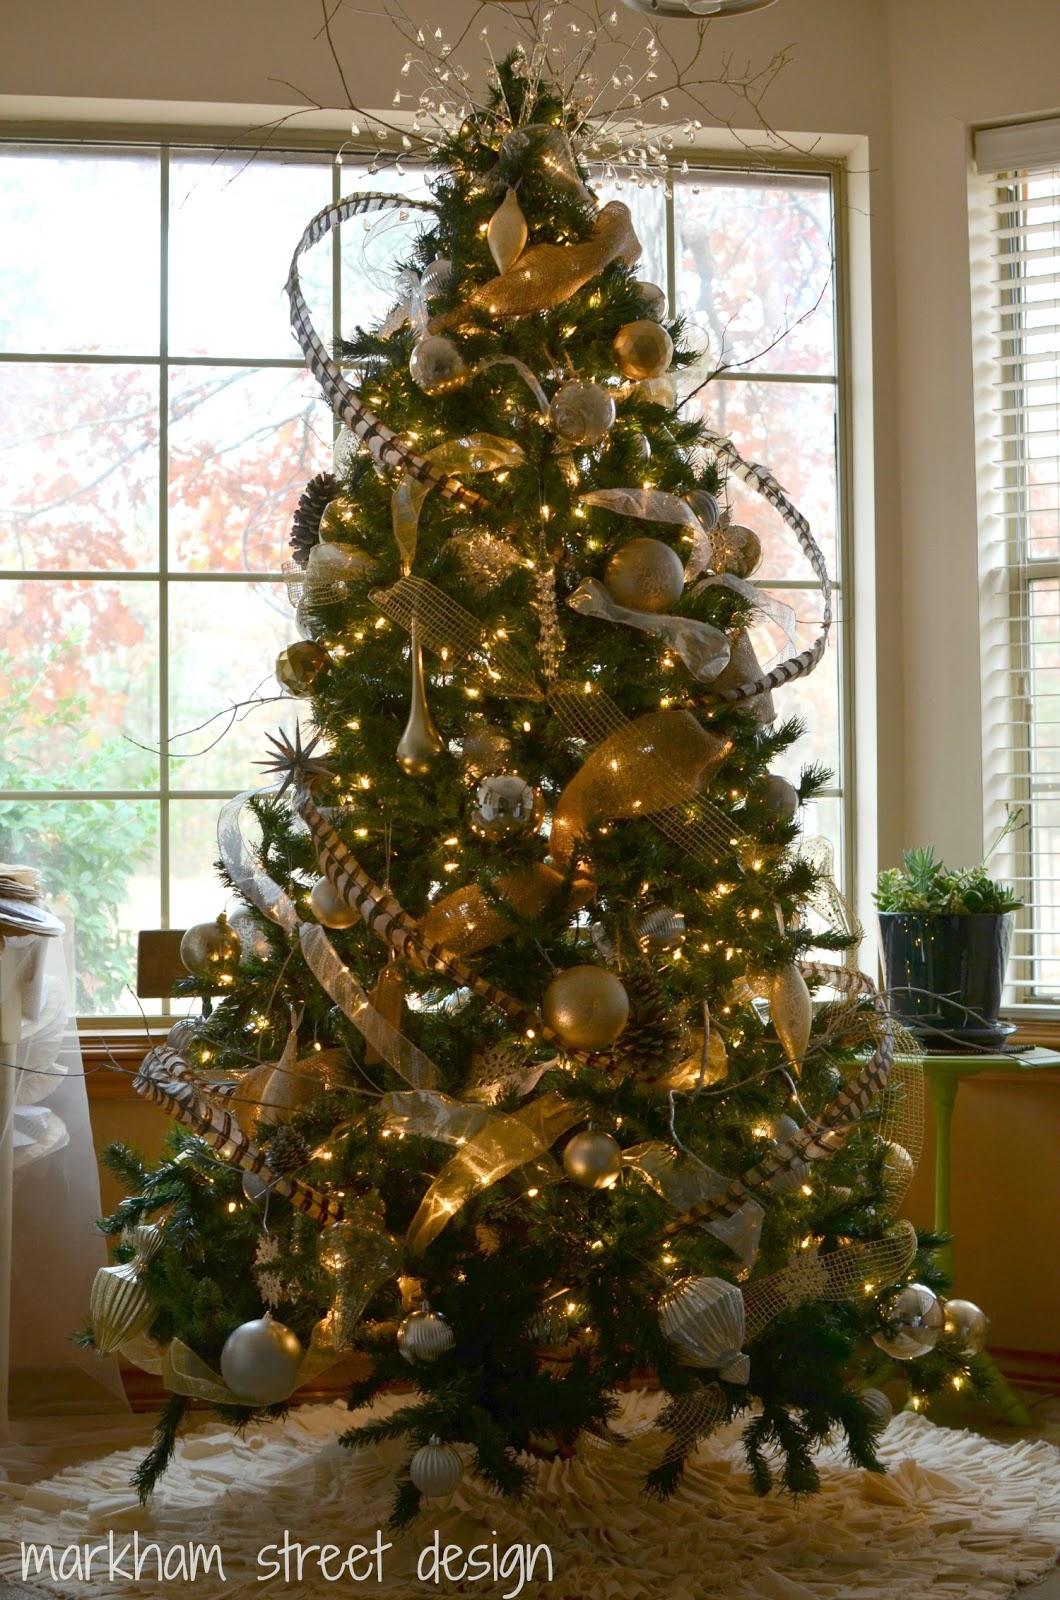 Rustic Christmas Decor Small Living Room: Laura Orr Interiors: Rustic Glam Christmas Tree